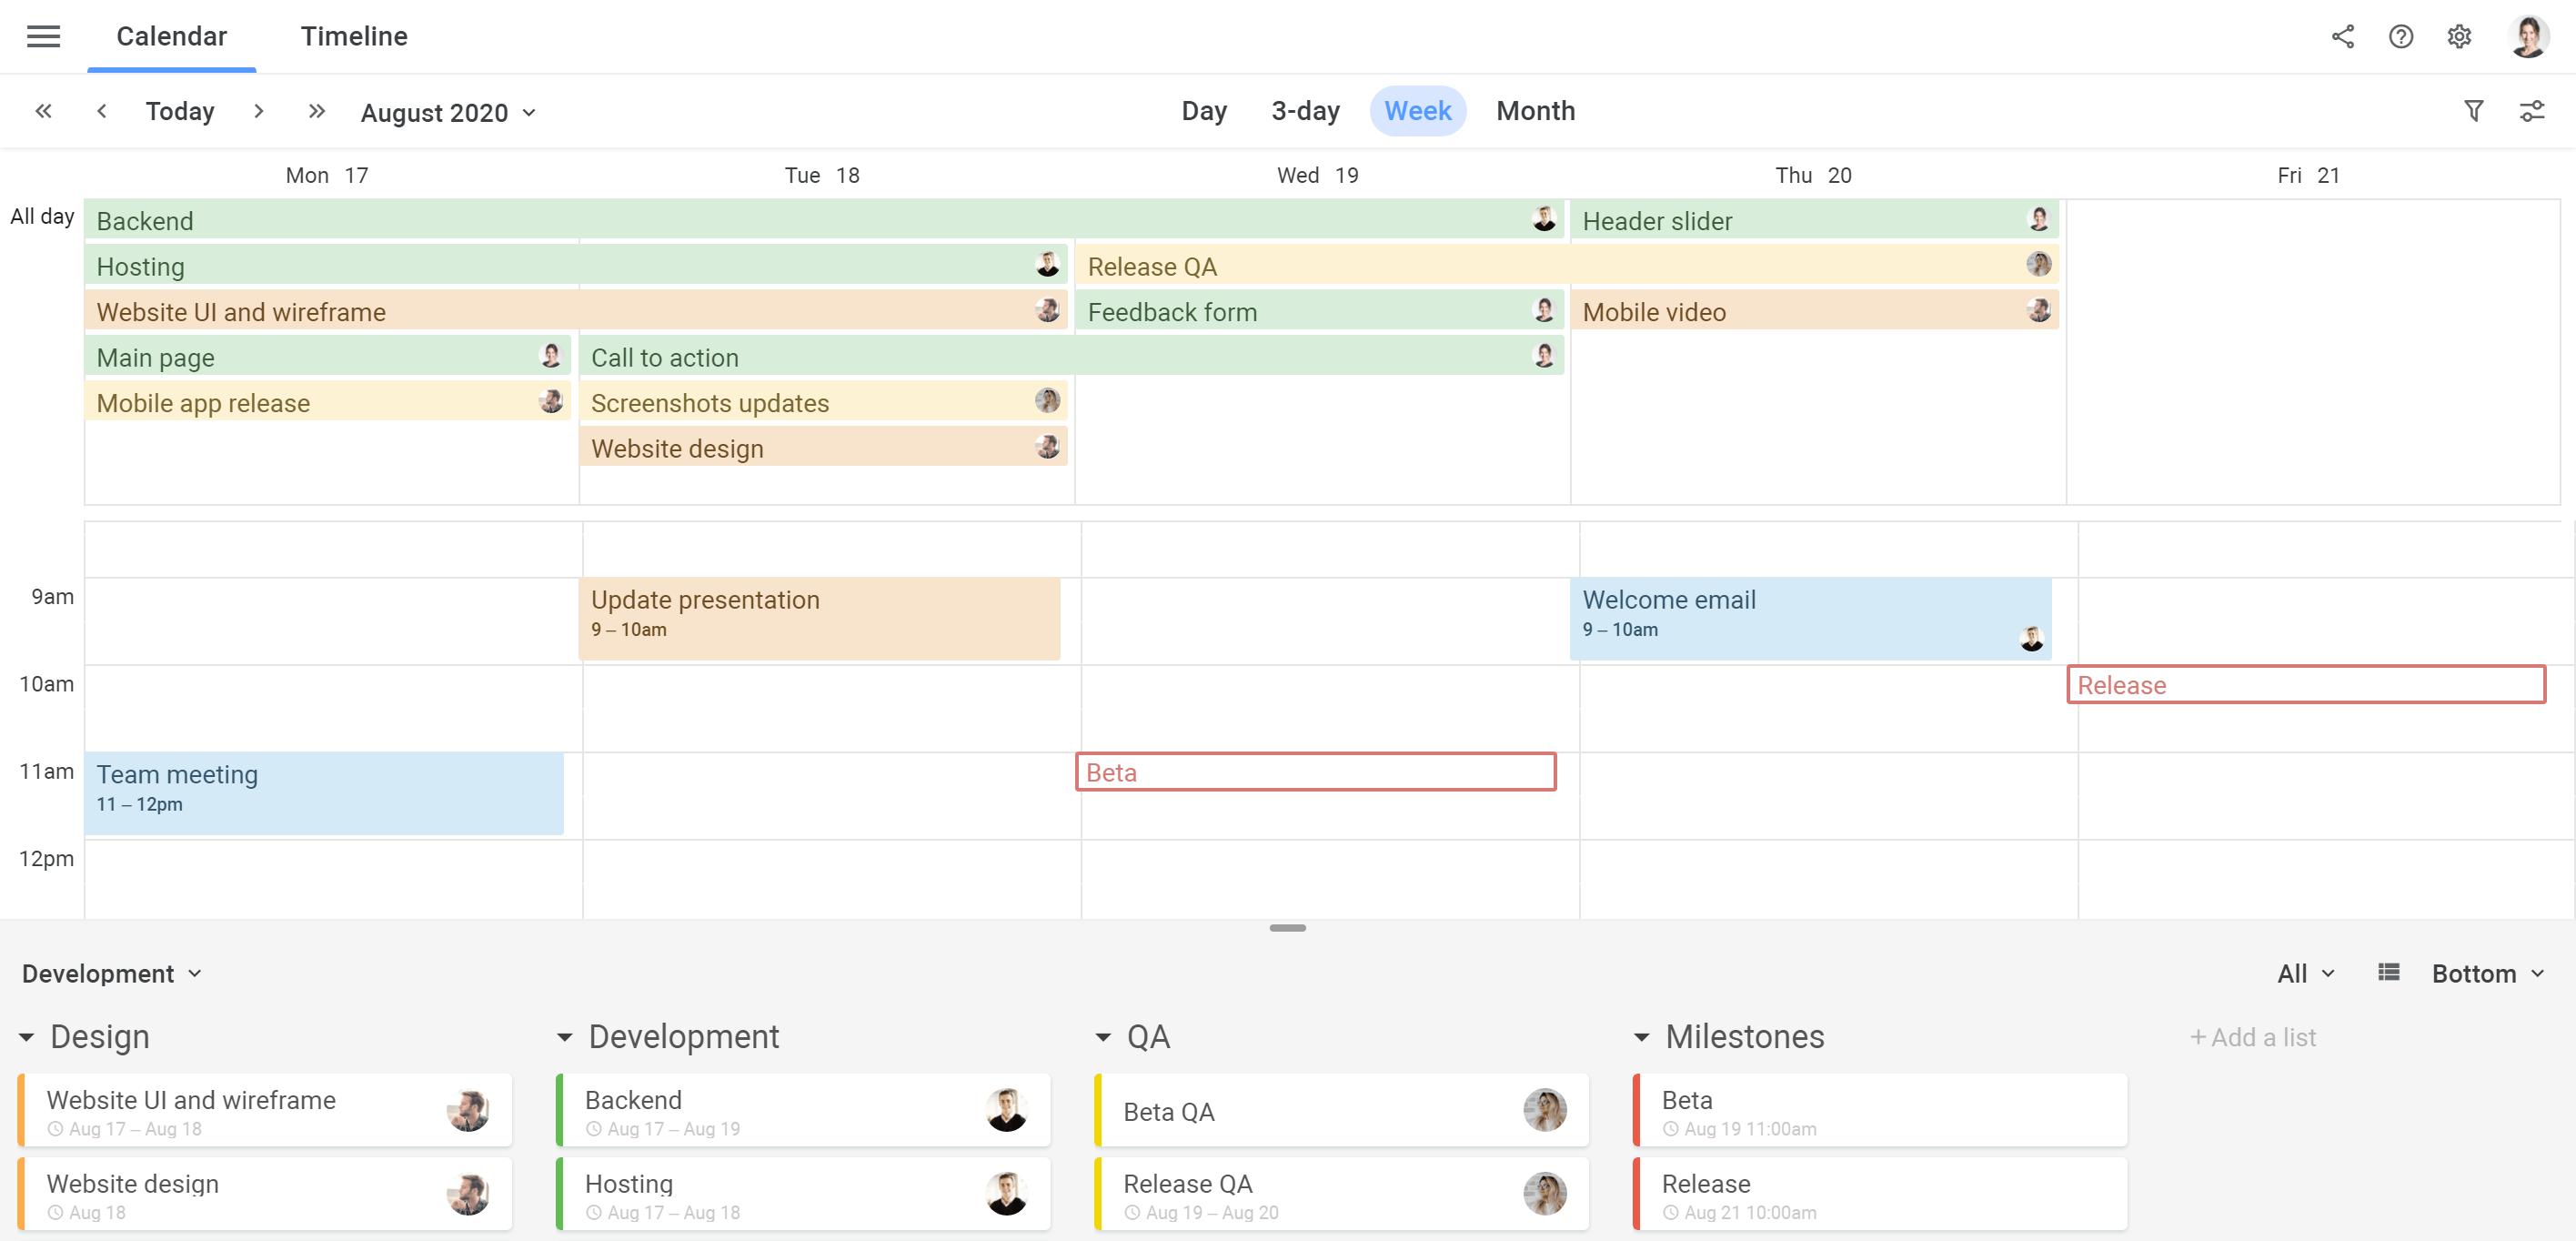 Planyway milestones in calendar view